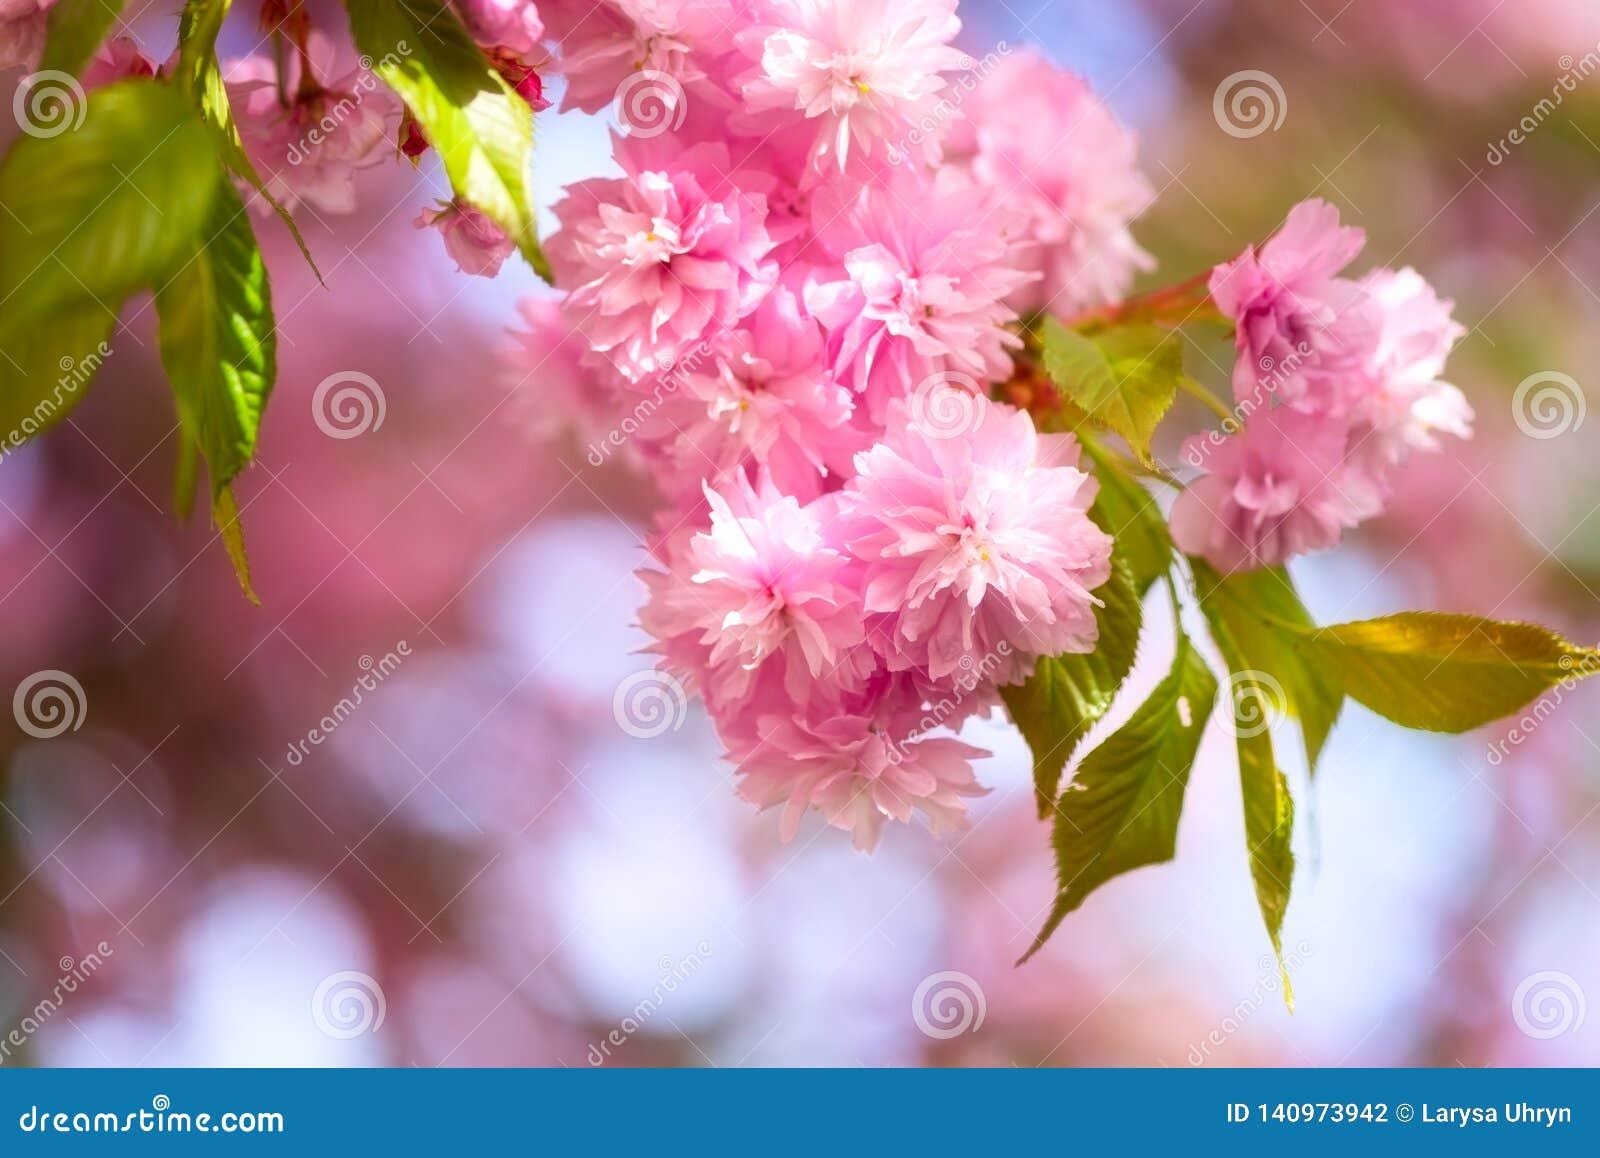 Blossoming Of Sakura Pink Flowers In Spring Garden, Natural